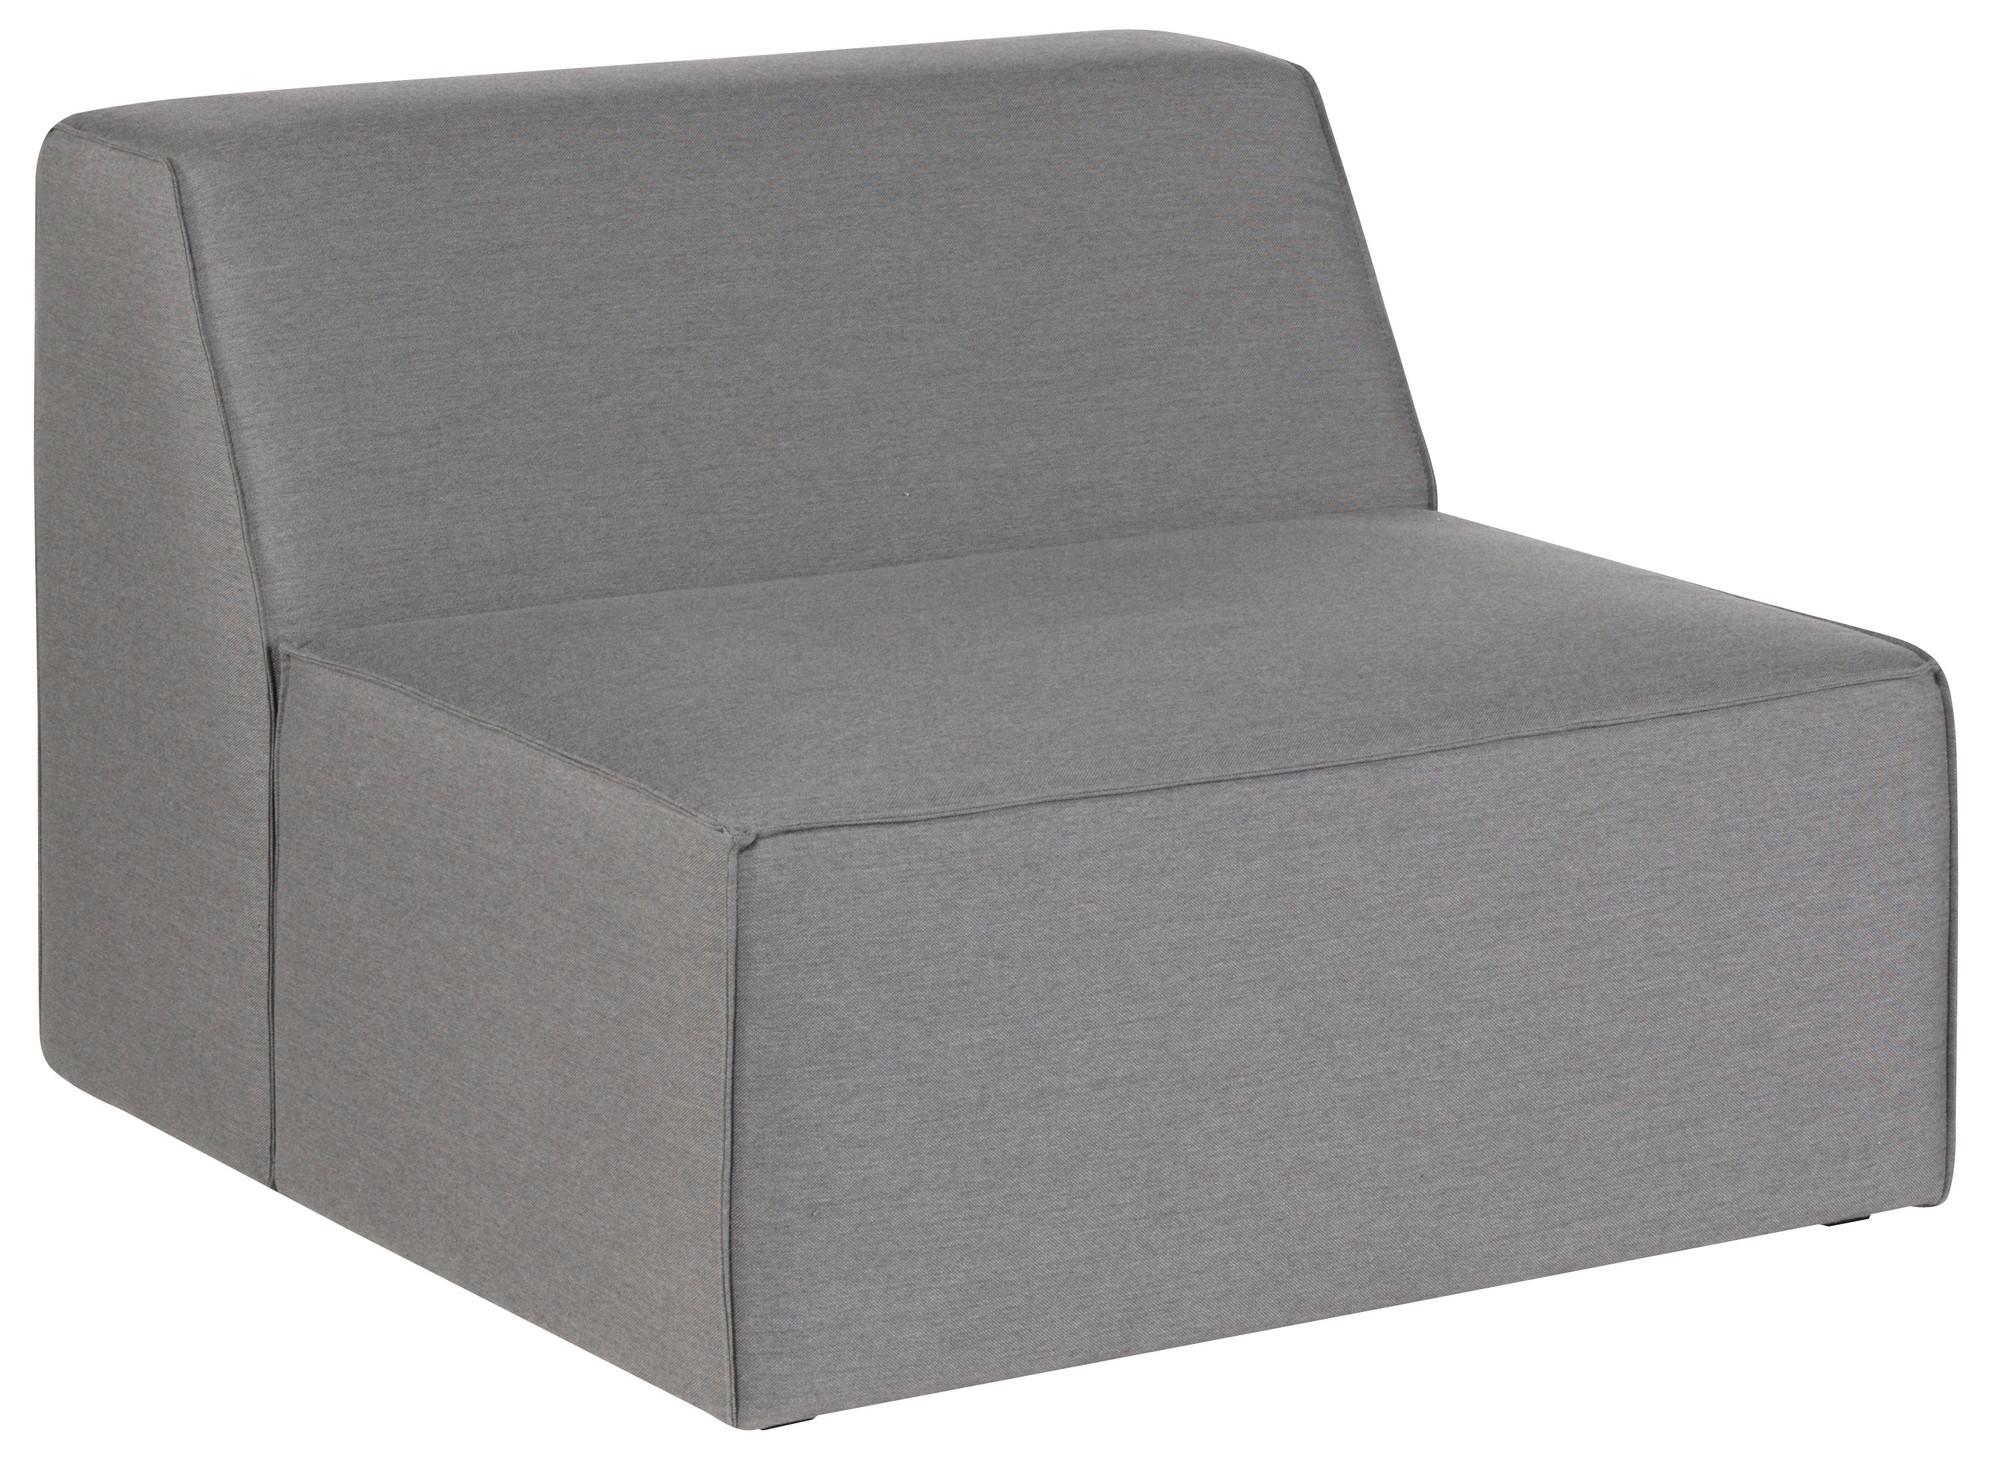 Triniti loungesethoekbank vino sunbrella antracietgrijslichtgrijs persoon outdoor living triniti - Lounge design grijs ...